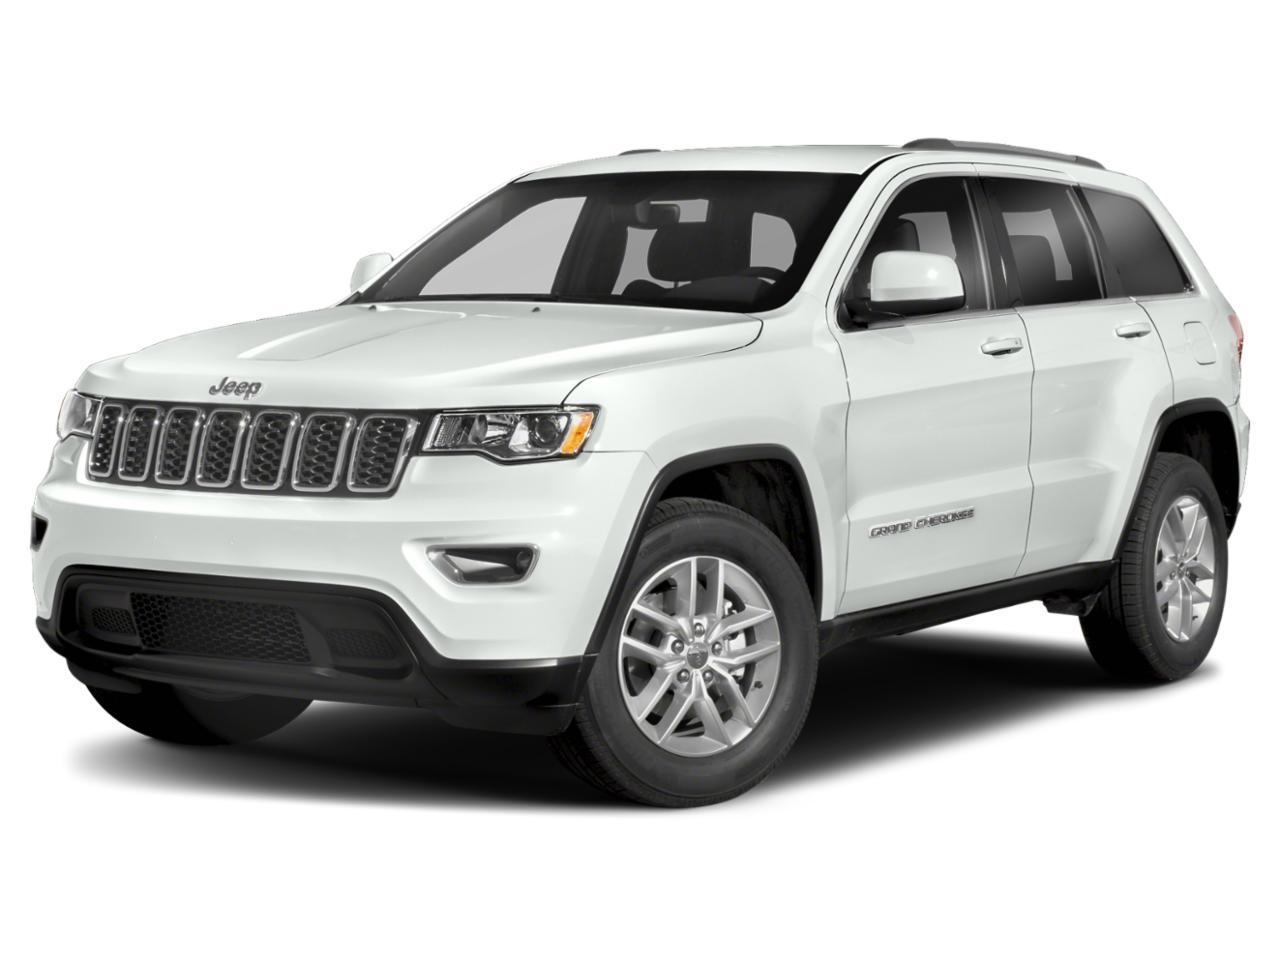 2021 Jeep Grand Cherokee Vehicle Photo in Emporia, VA 23847